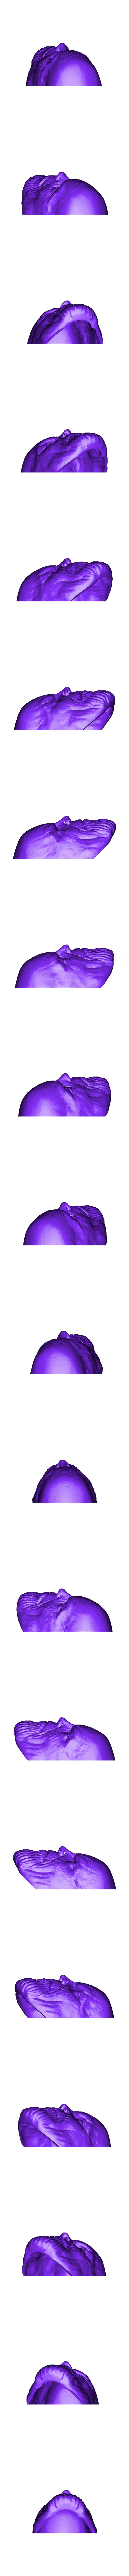 Thanos_Mask.stl Download free STL file Thanos Mask • Design to 3D print, B1nkfish